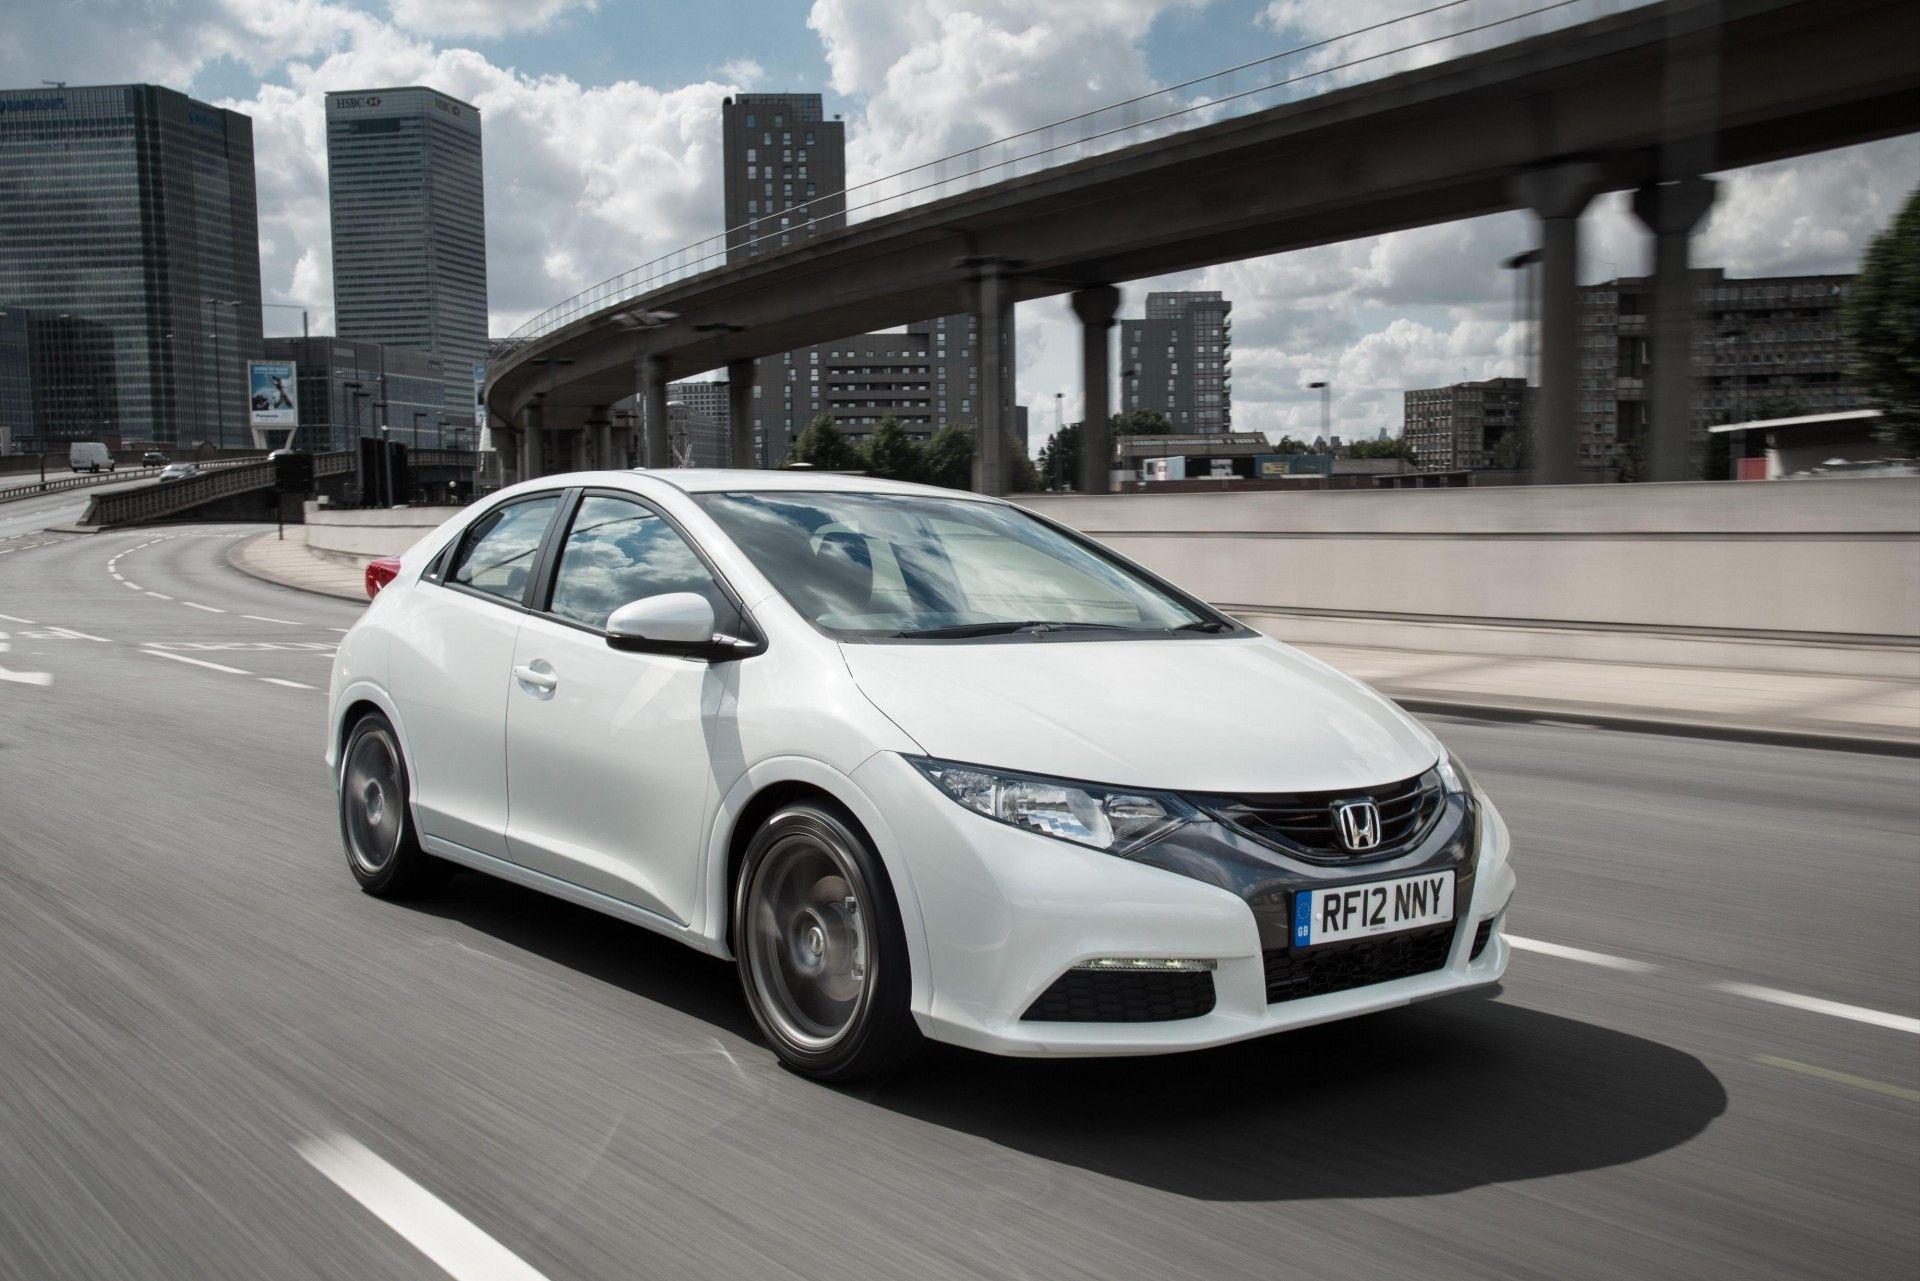 2013 Honda Civic Hatchback Limited Edition